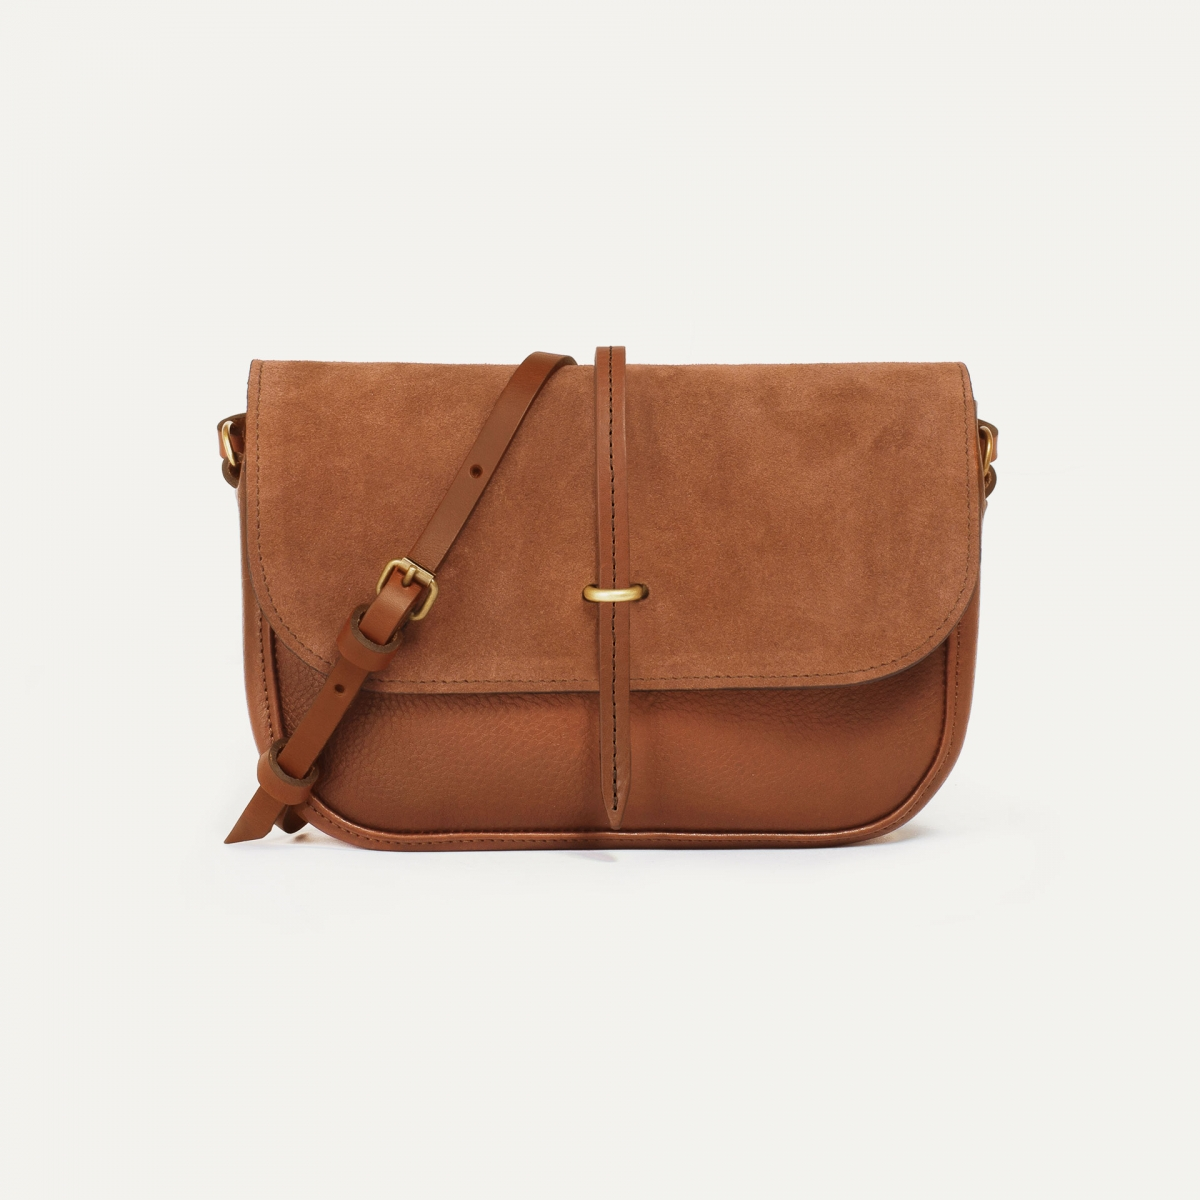 Pastis handbag - Havana / Mix (image n°1)